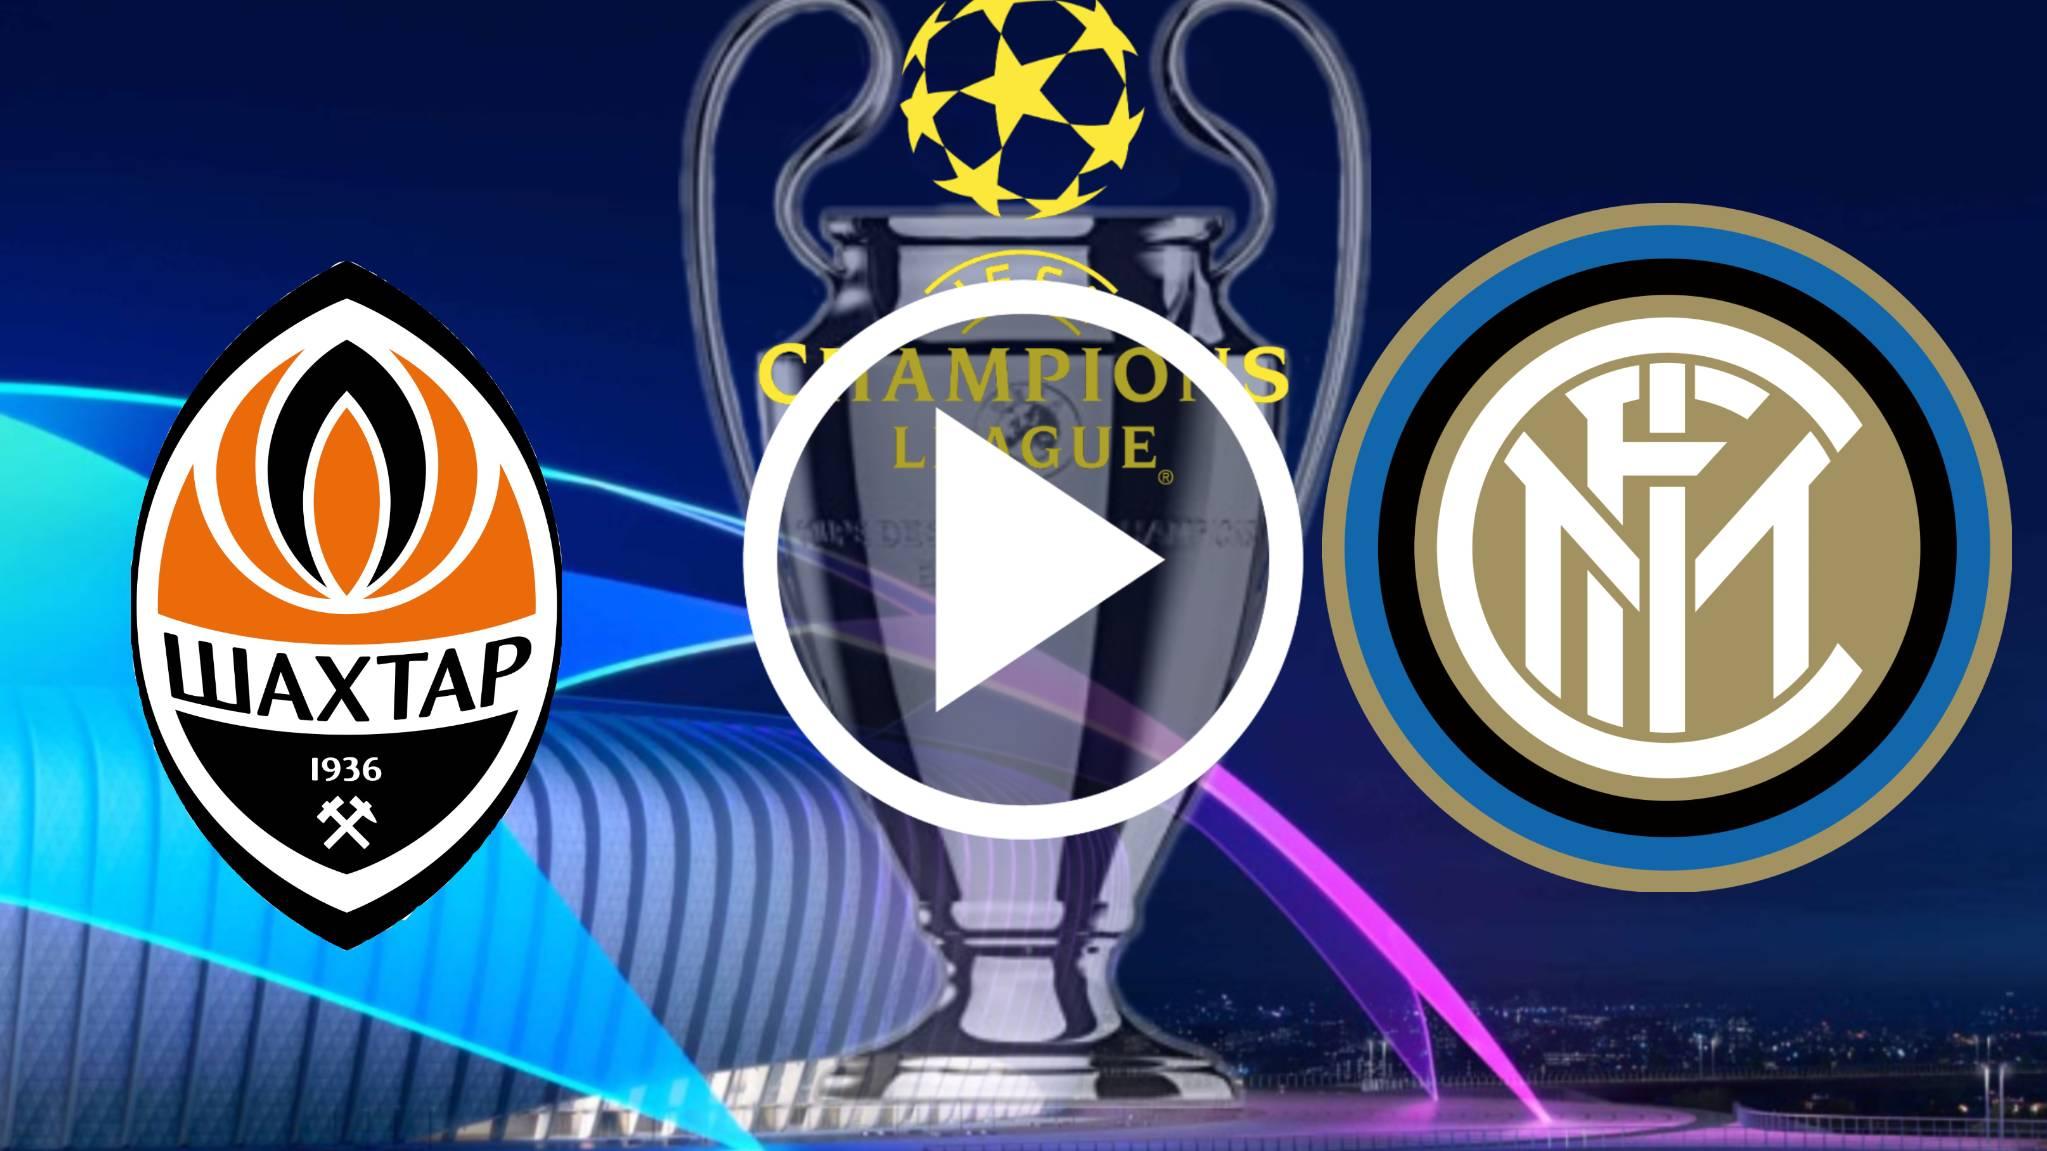 AQUI EN VIVO GRATIS ONLINE Shakhtar Donetsk vs Inter Milan POR LA UEFA Champions League 20-21